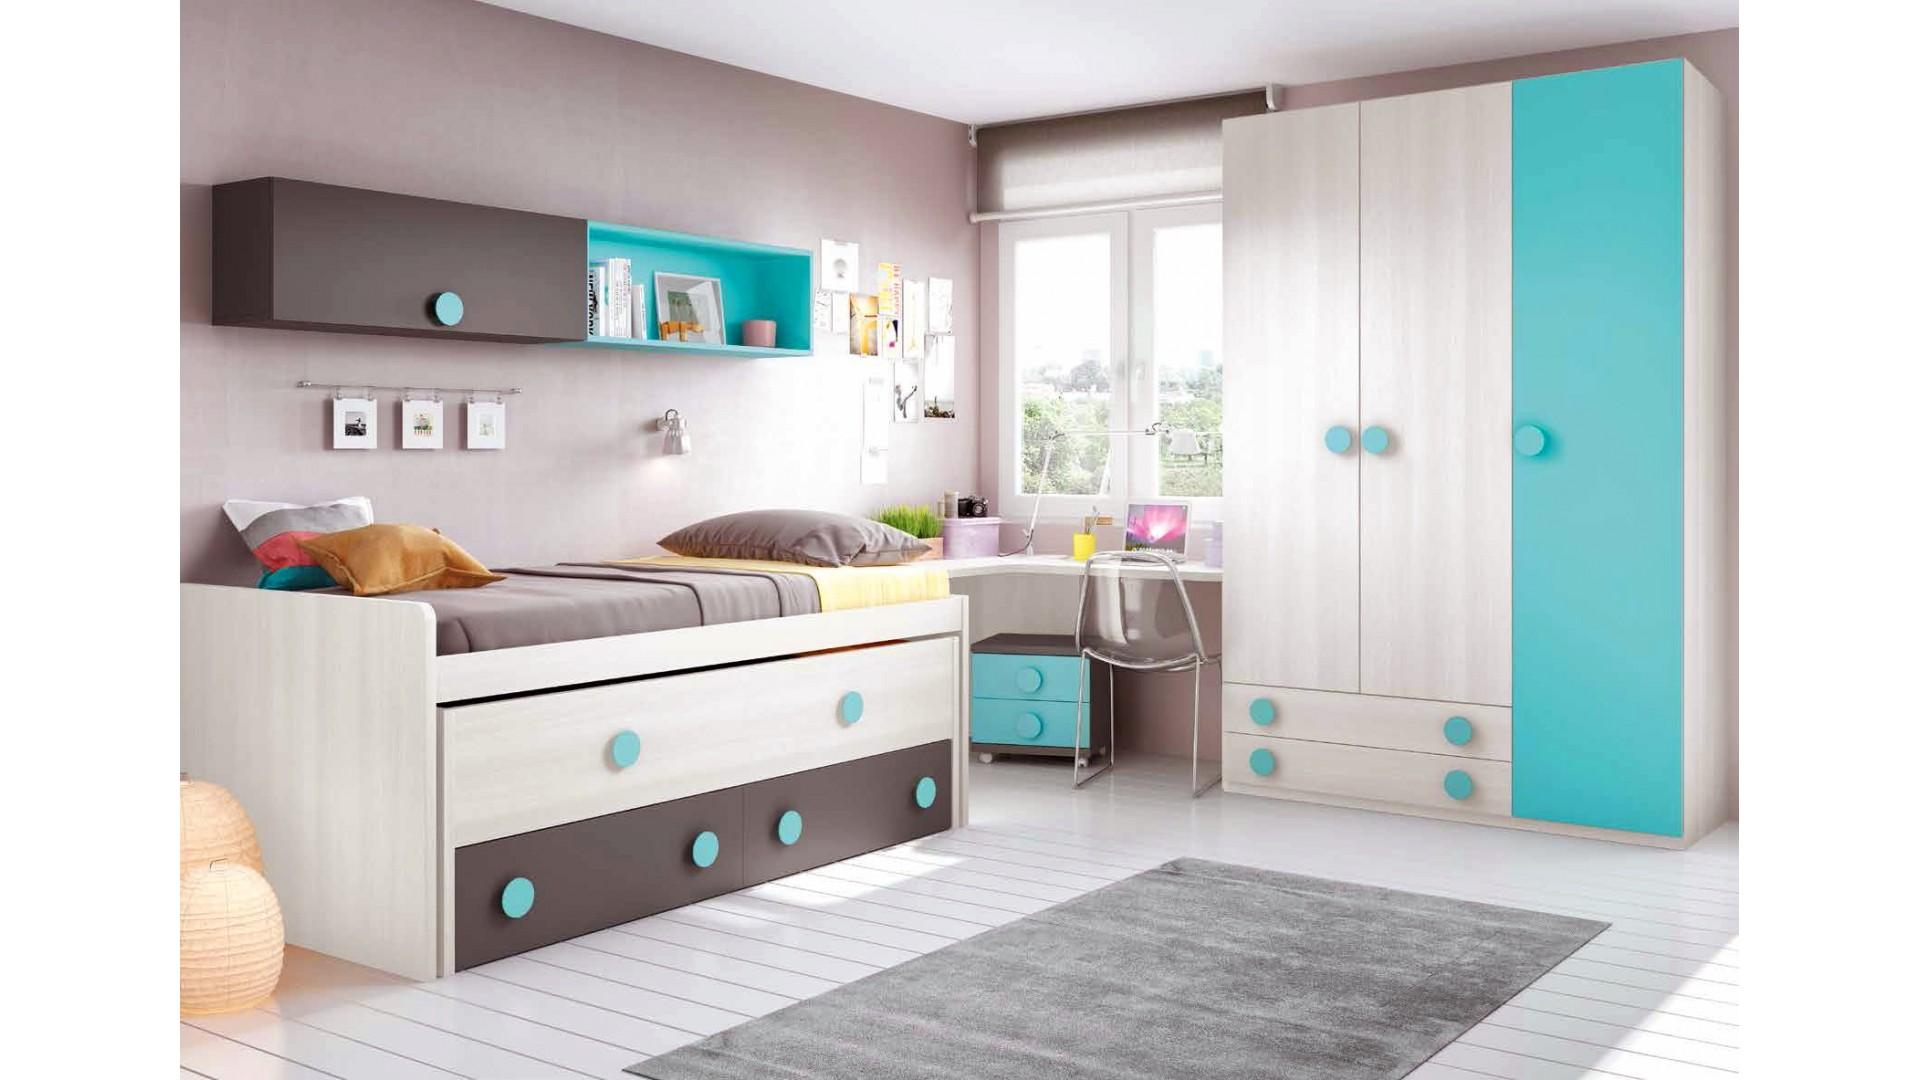 chambre moderne ado complete design et colorée - glicerio - so nuit